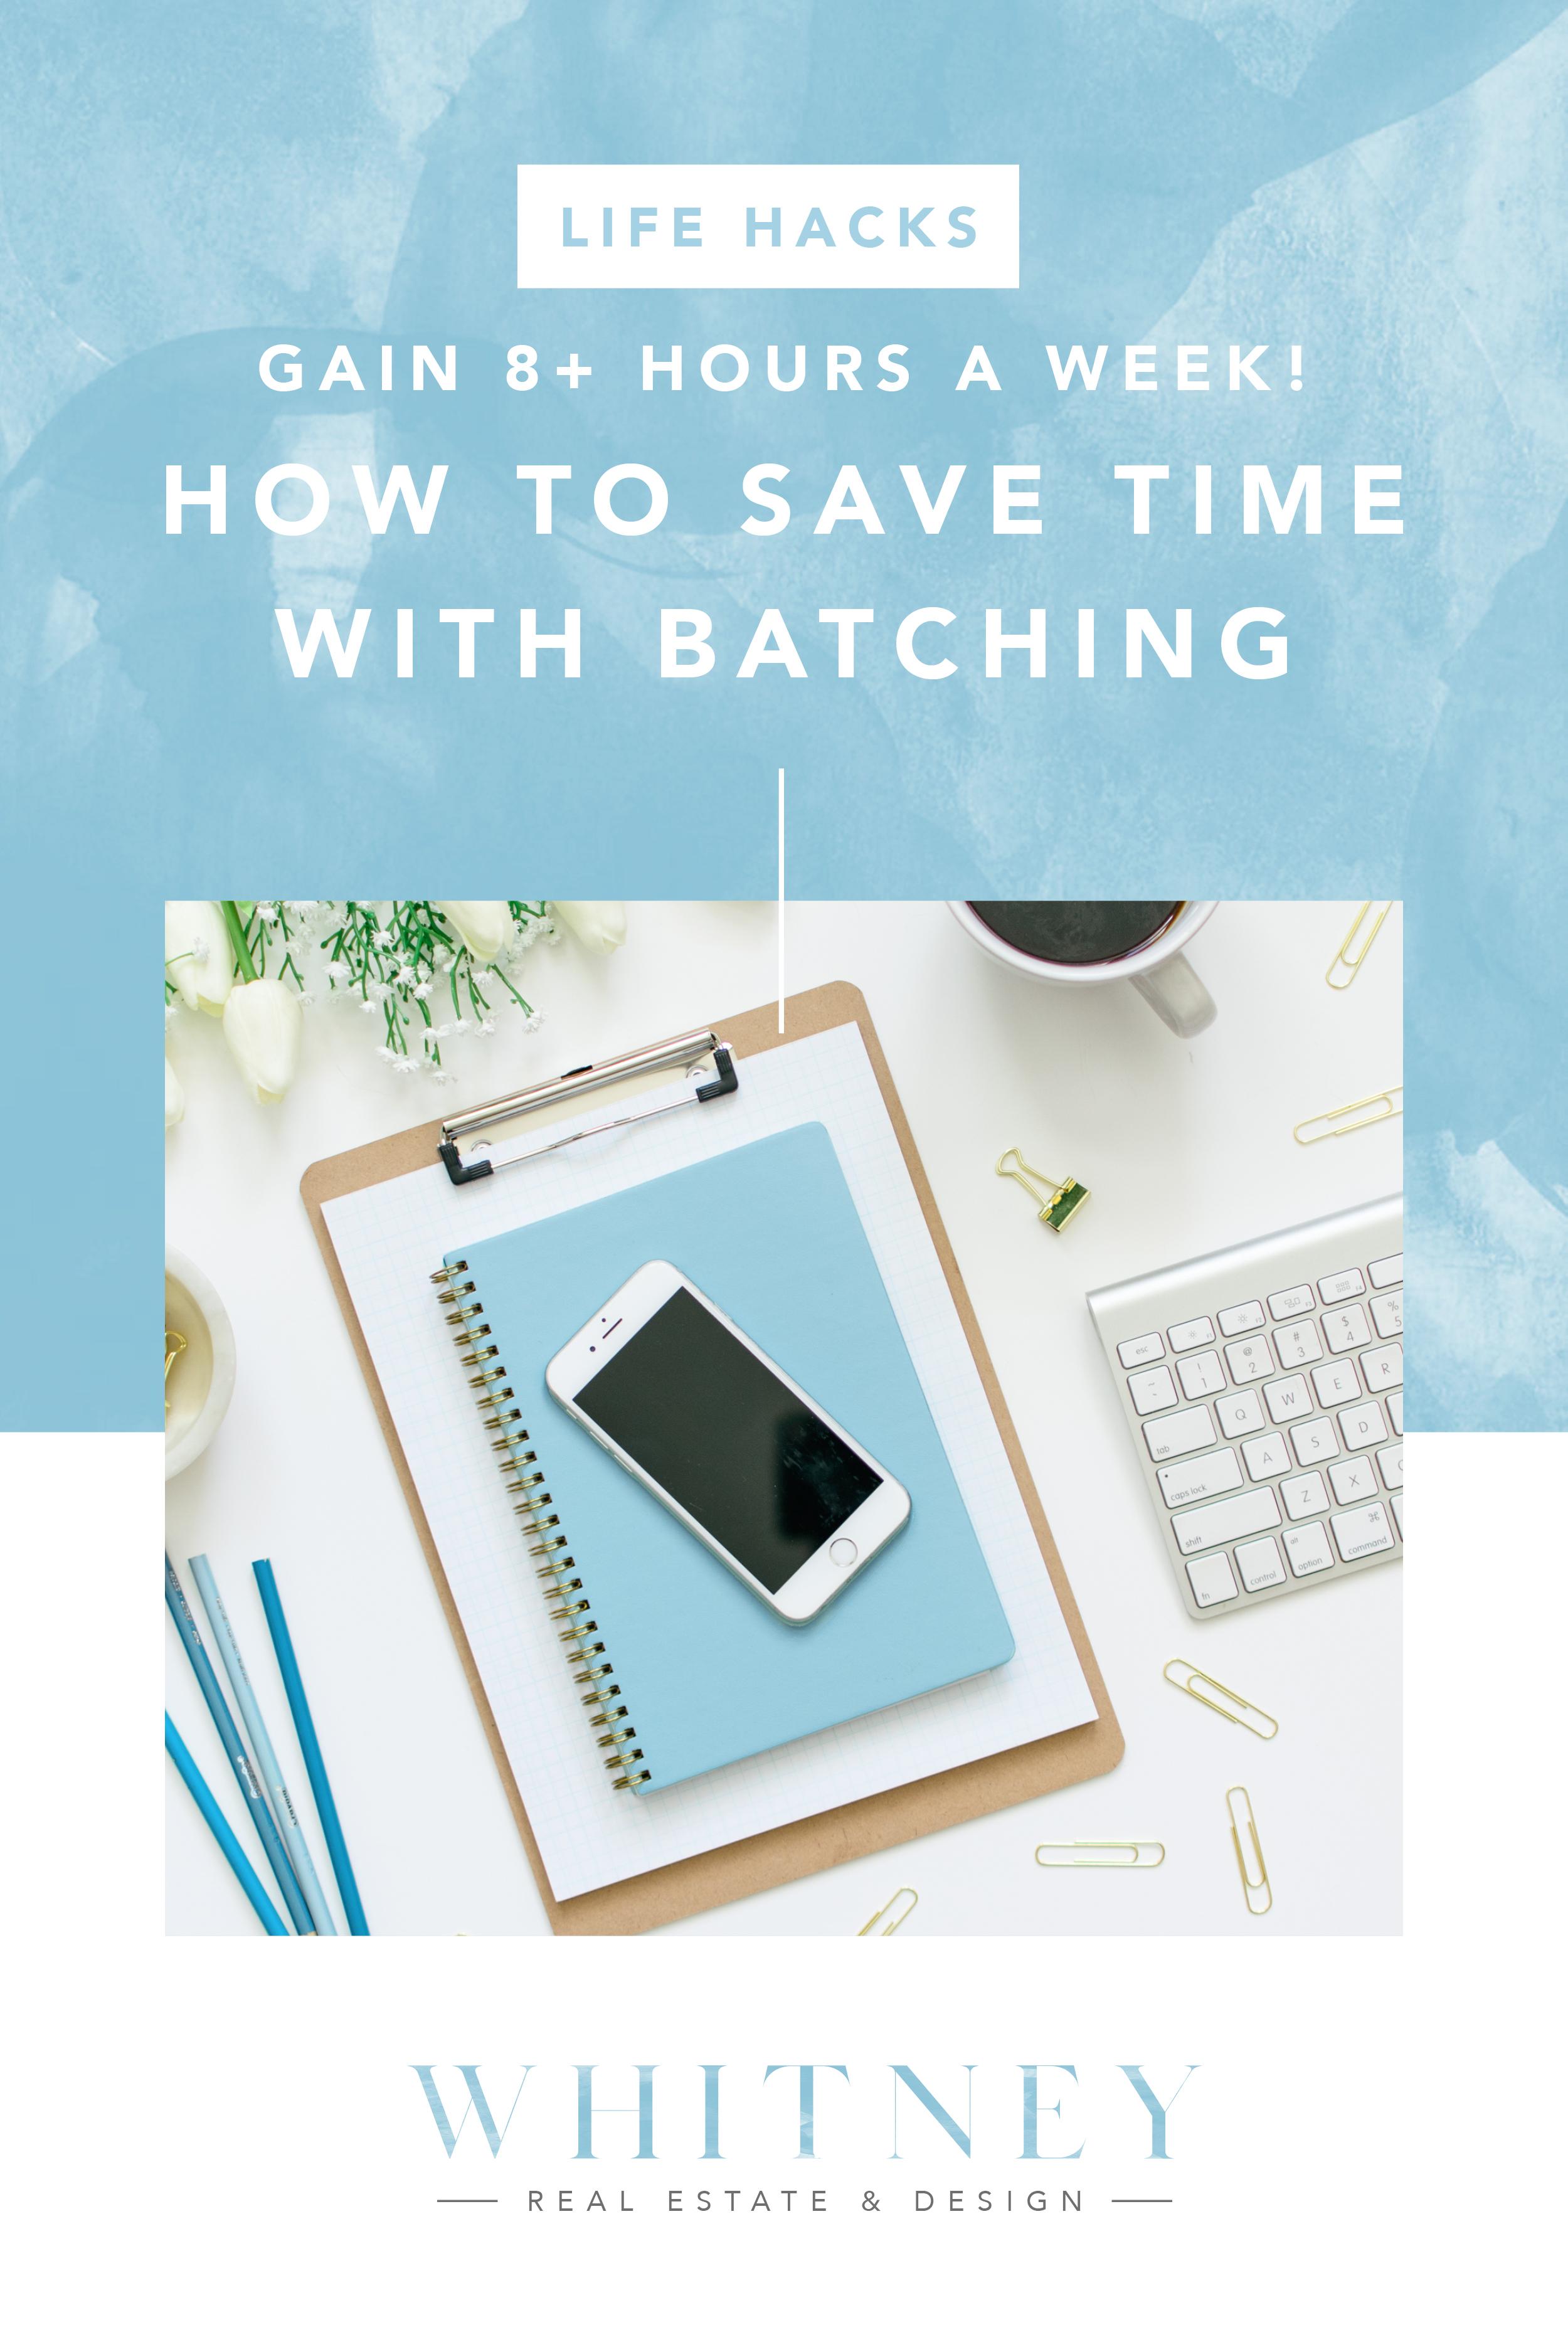 WH_Blog_Life-Hack-Batching11.jpg